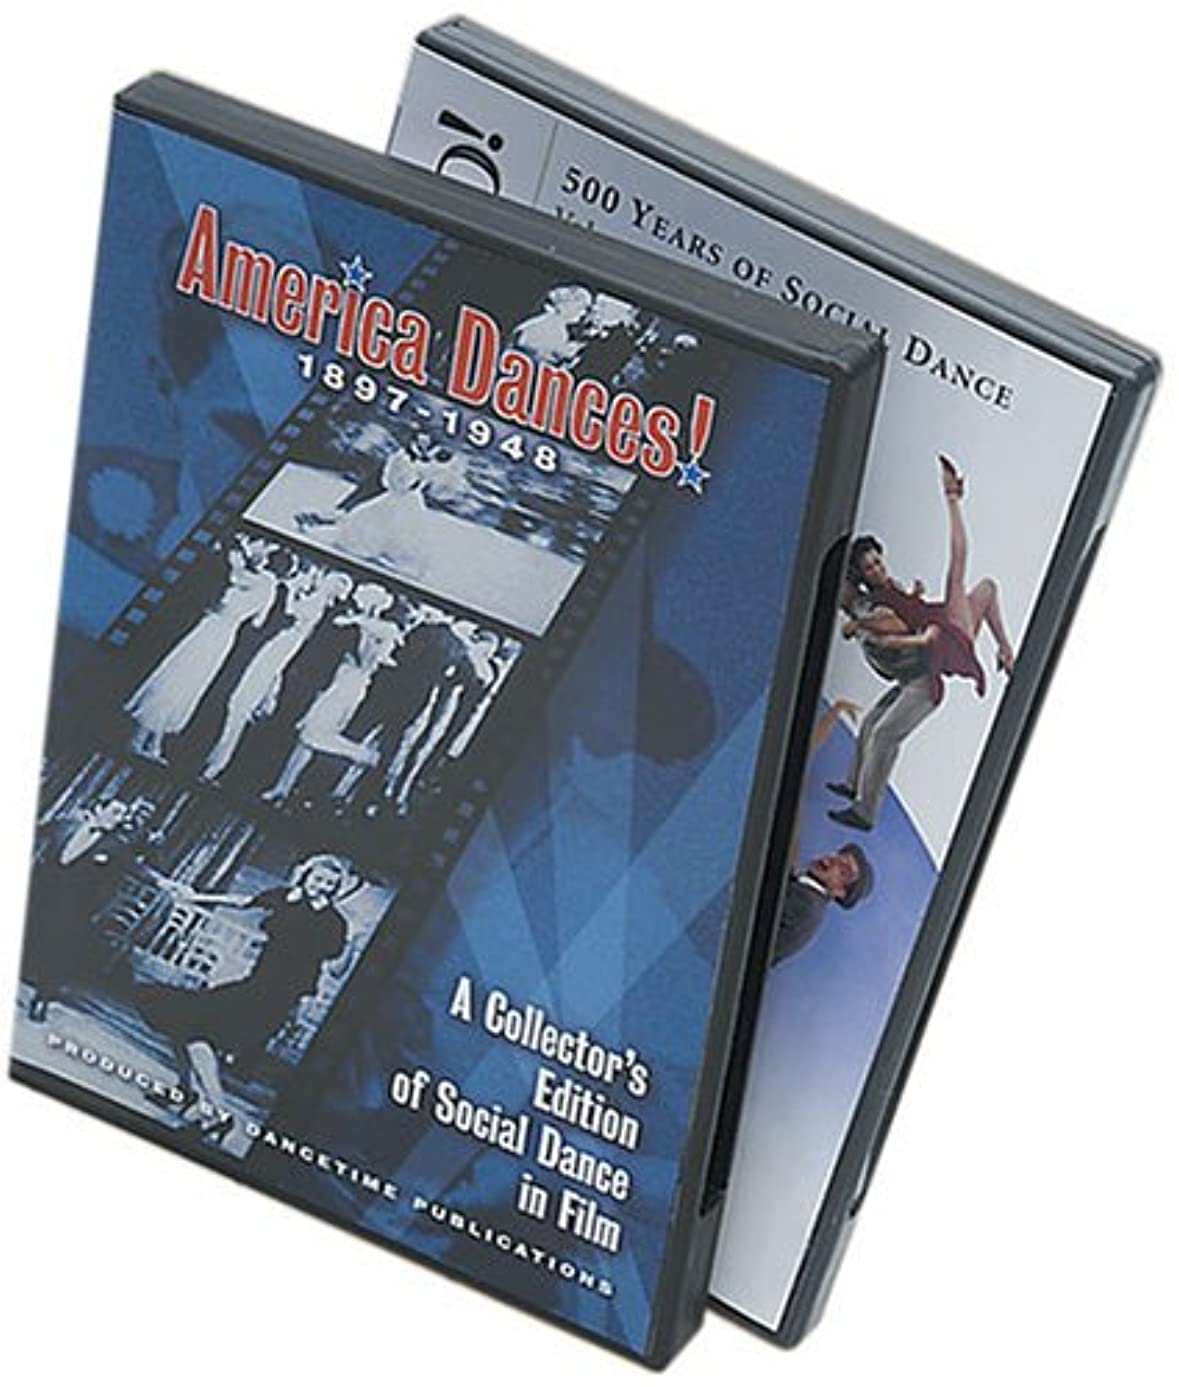 20th Century American Dance